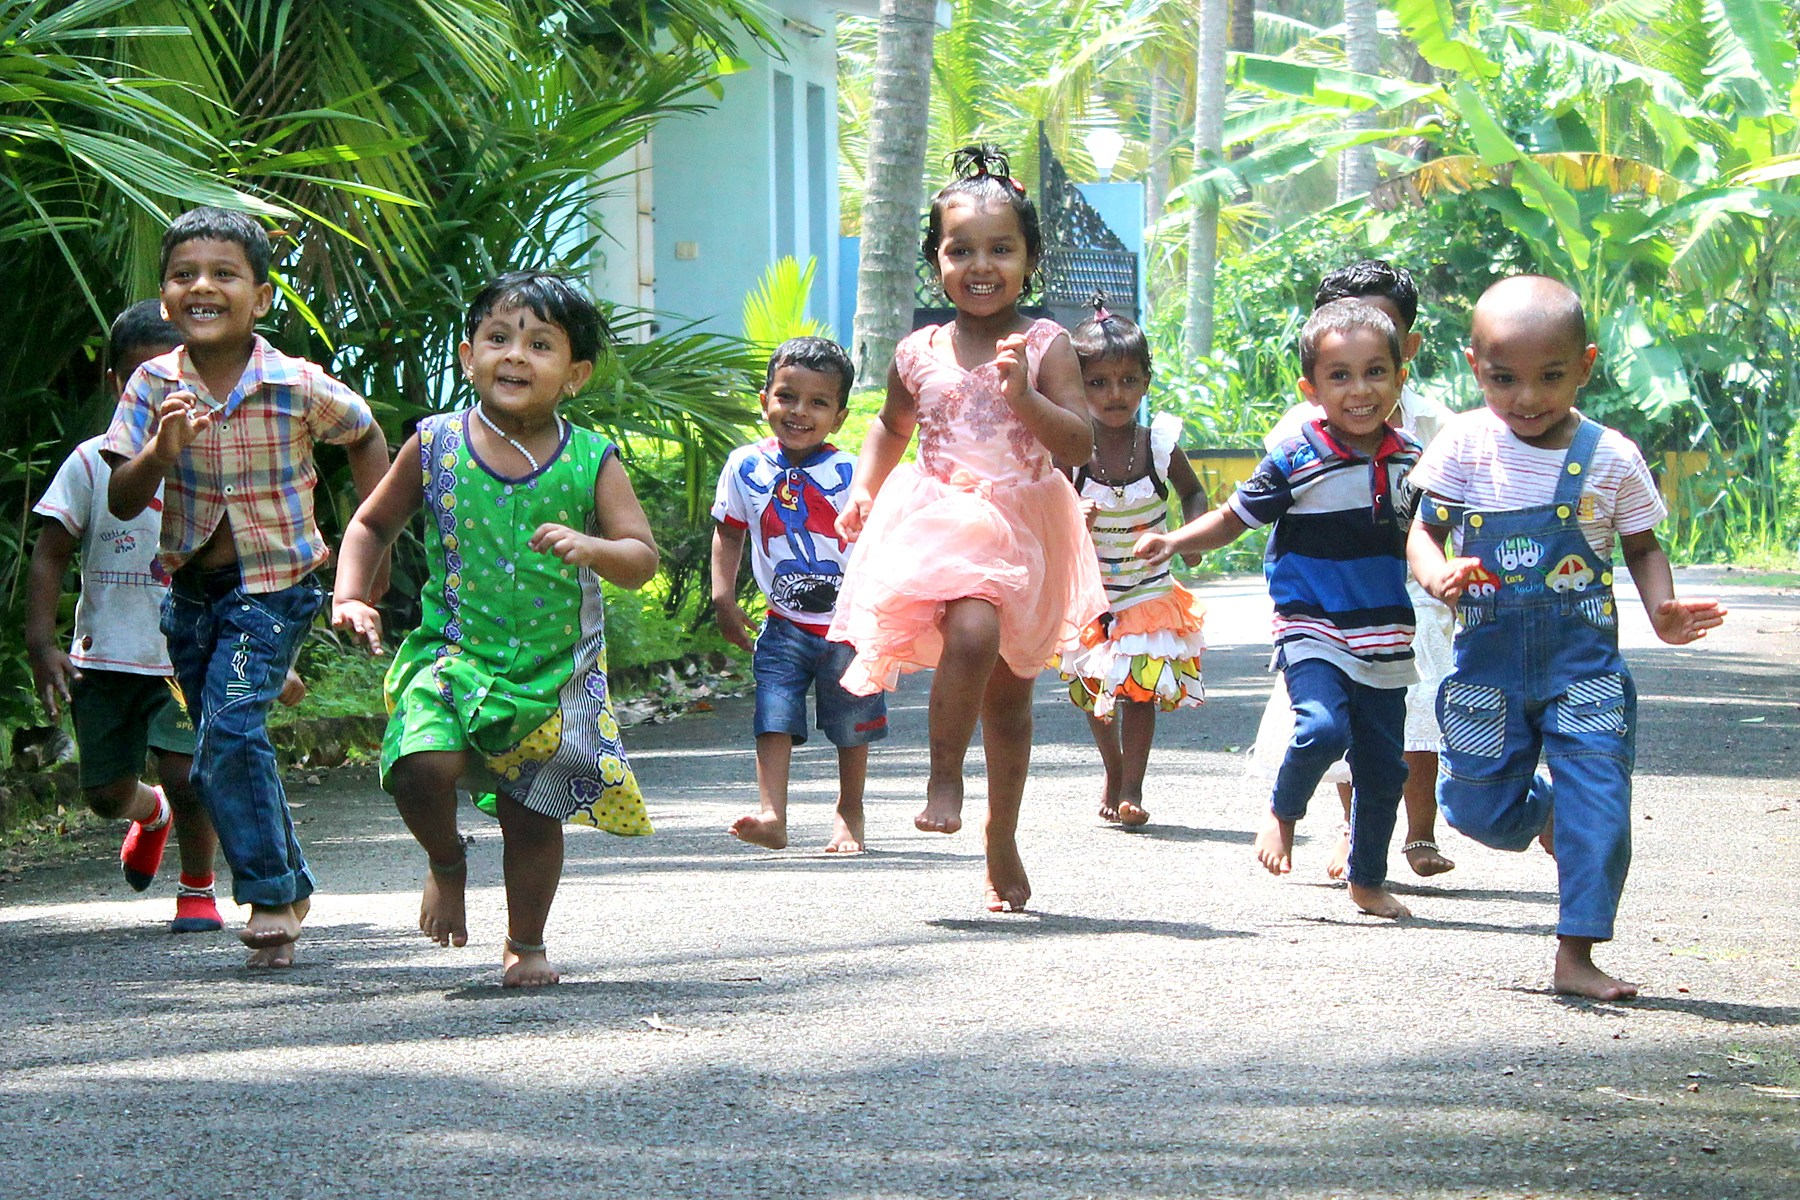 Niños jugando Thelathuruth